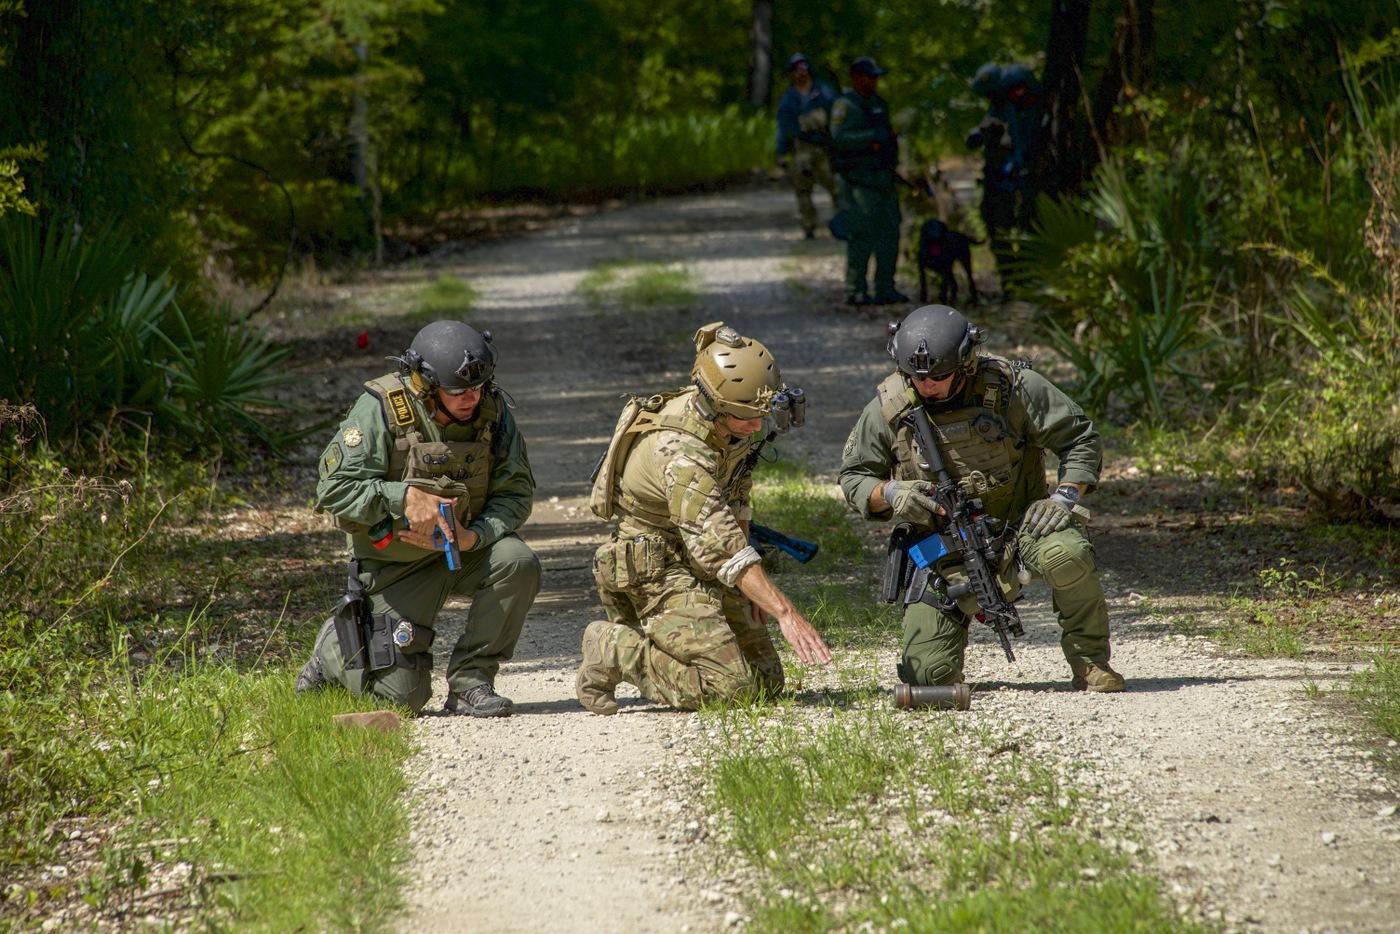 HRT Training: Bomb Technicians Examine Explosive Device